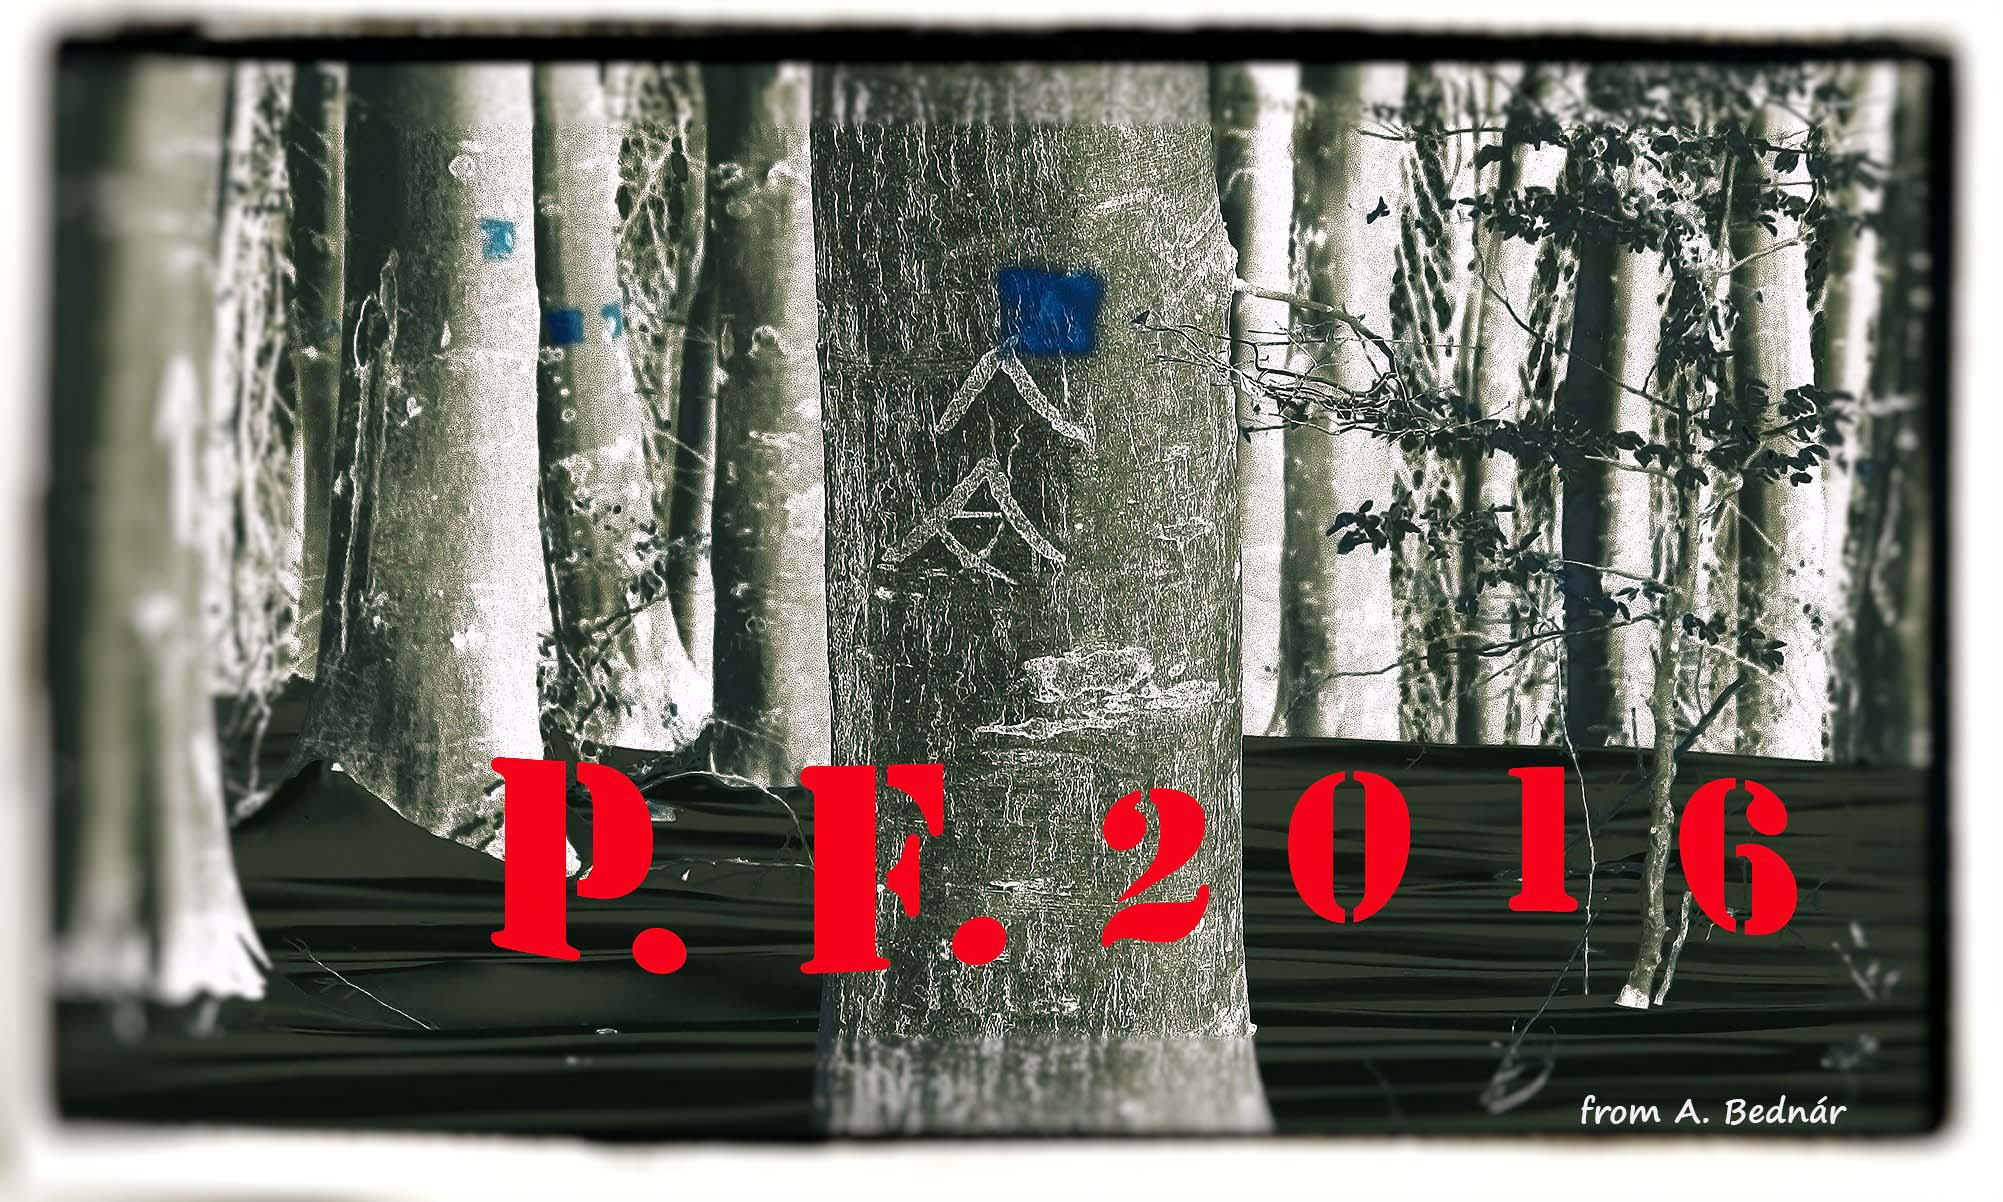 P.F. 2016